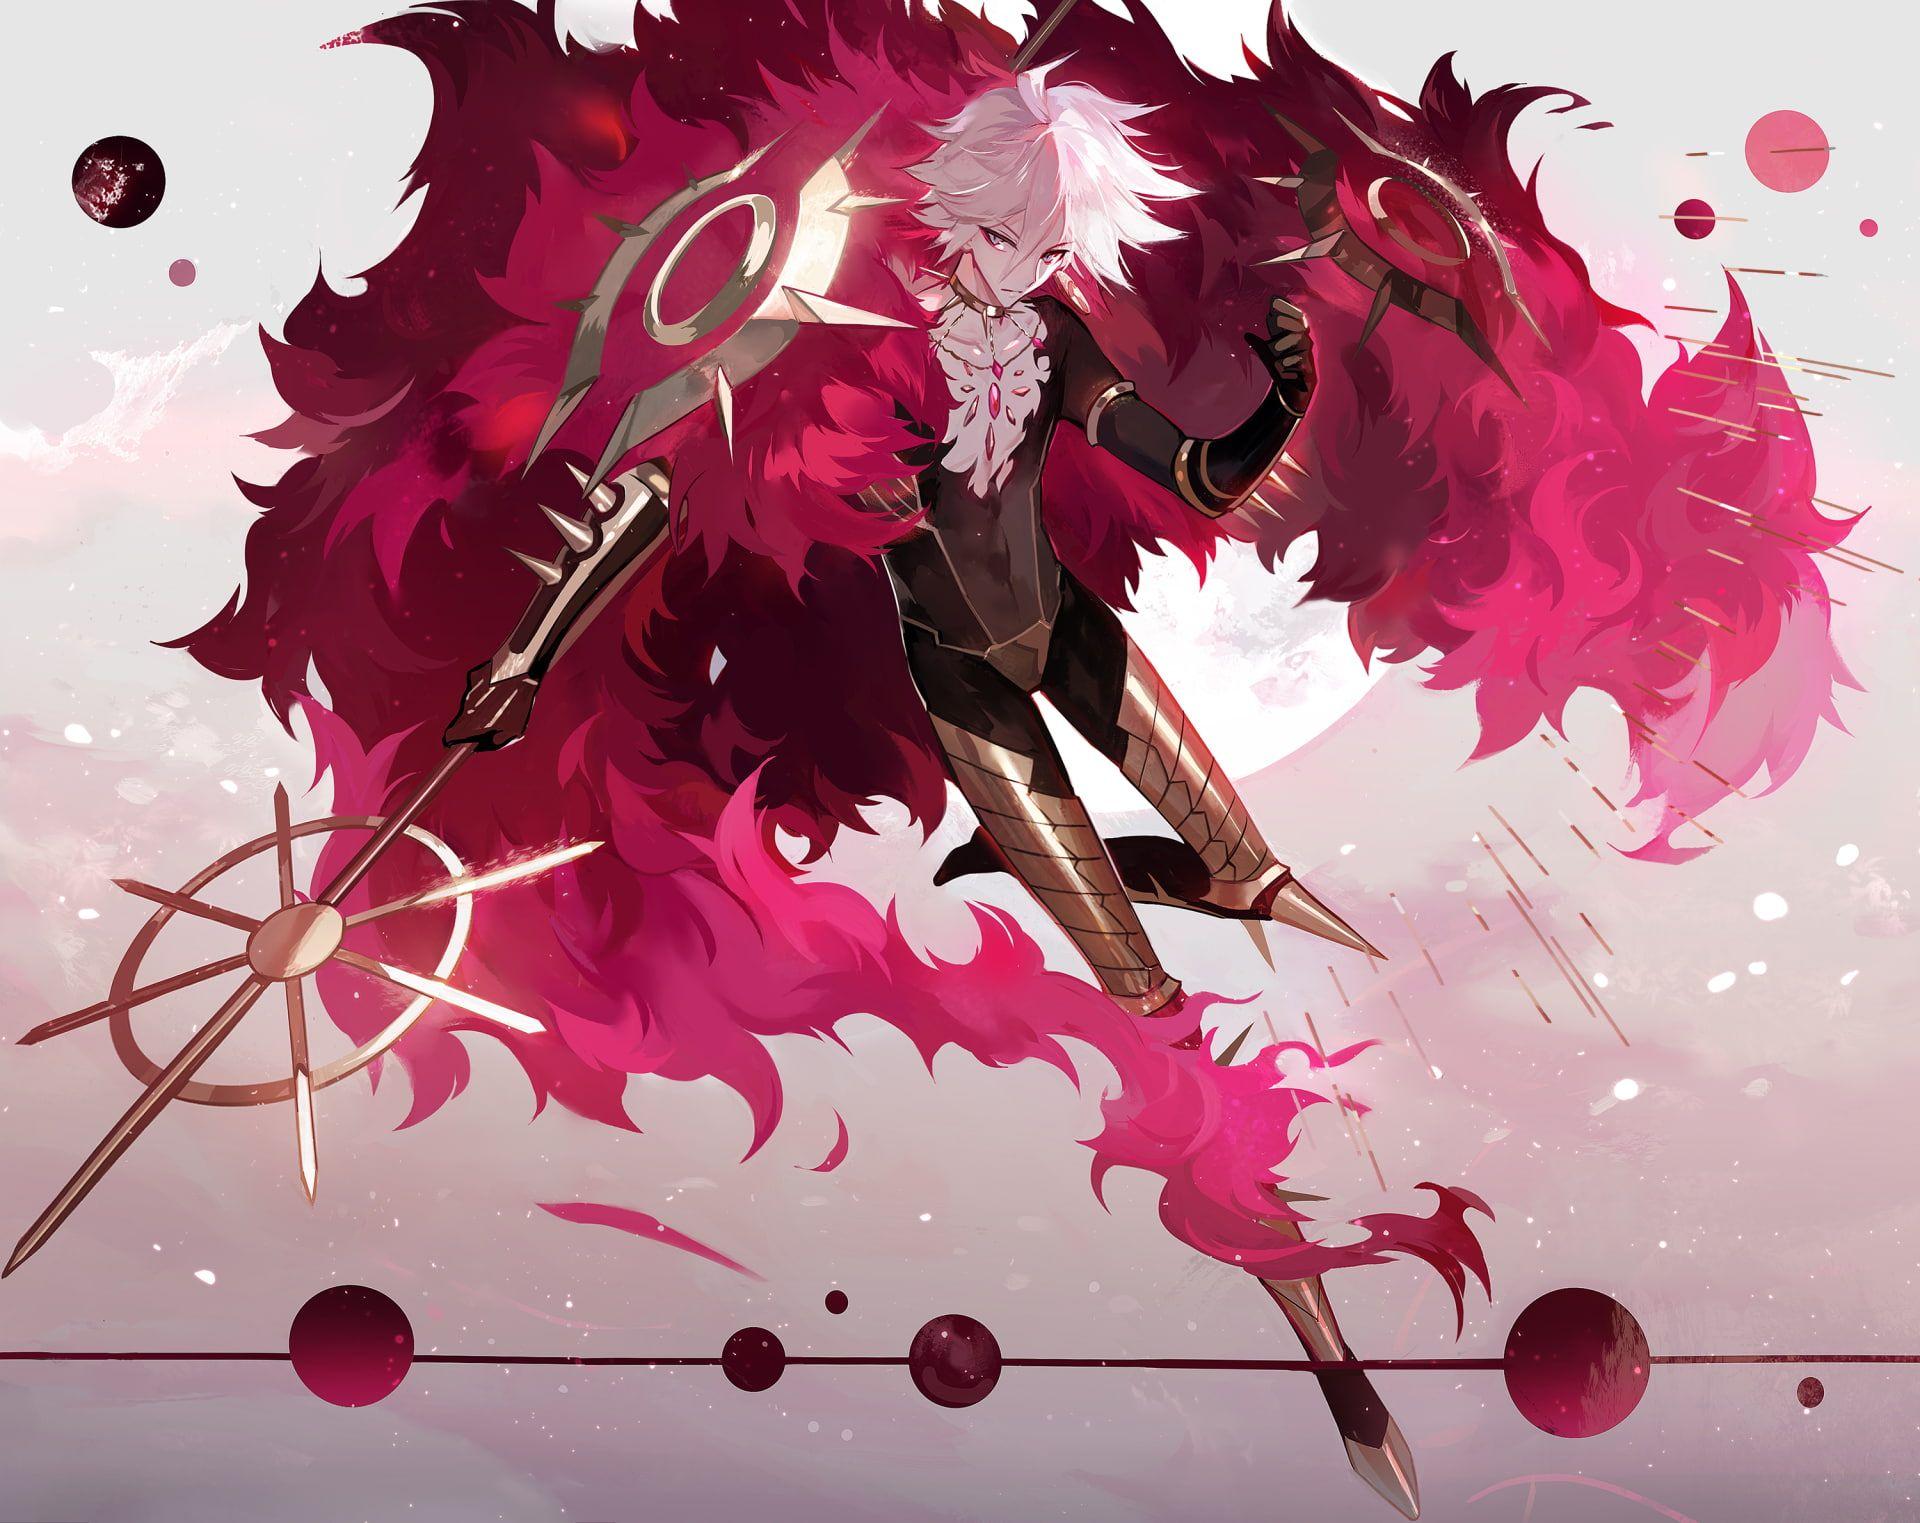 Fate Series FateGrand Order Karna FateApocrypha 1080P 1920x1523